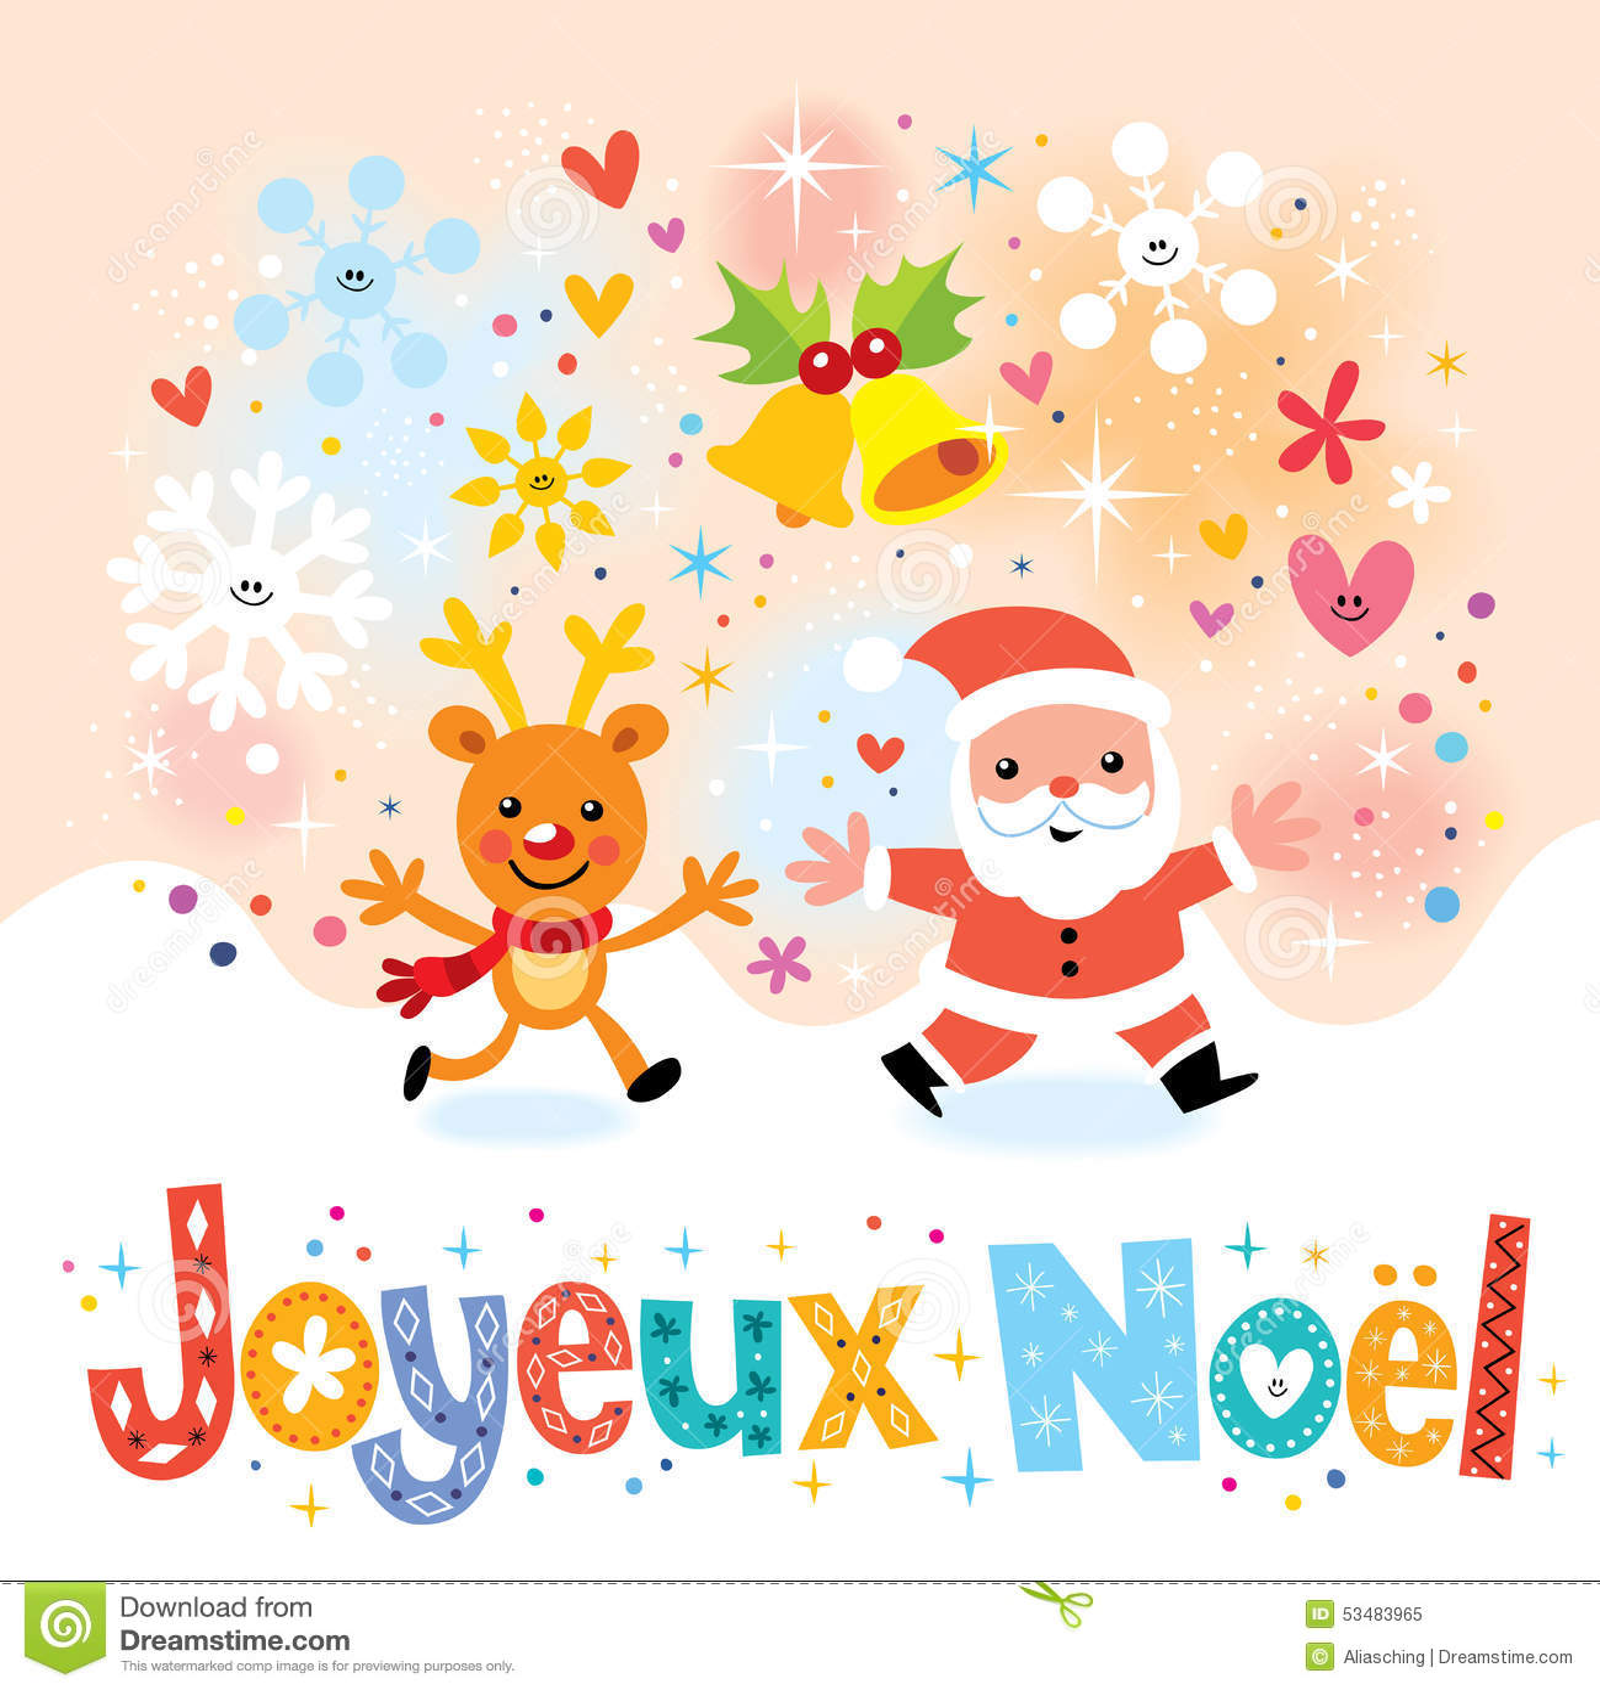 Joyeux Noel Merry Christmas In French Greeting Card Stock